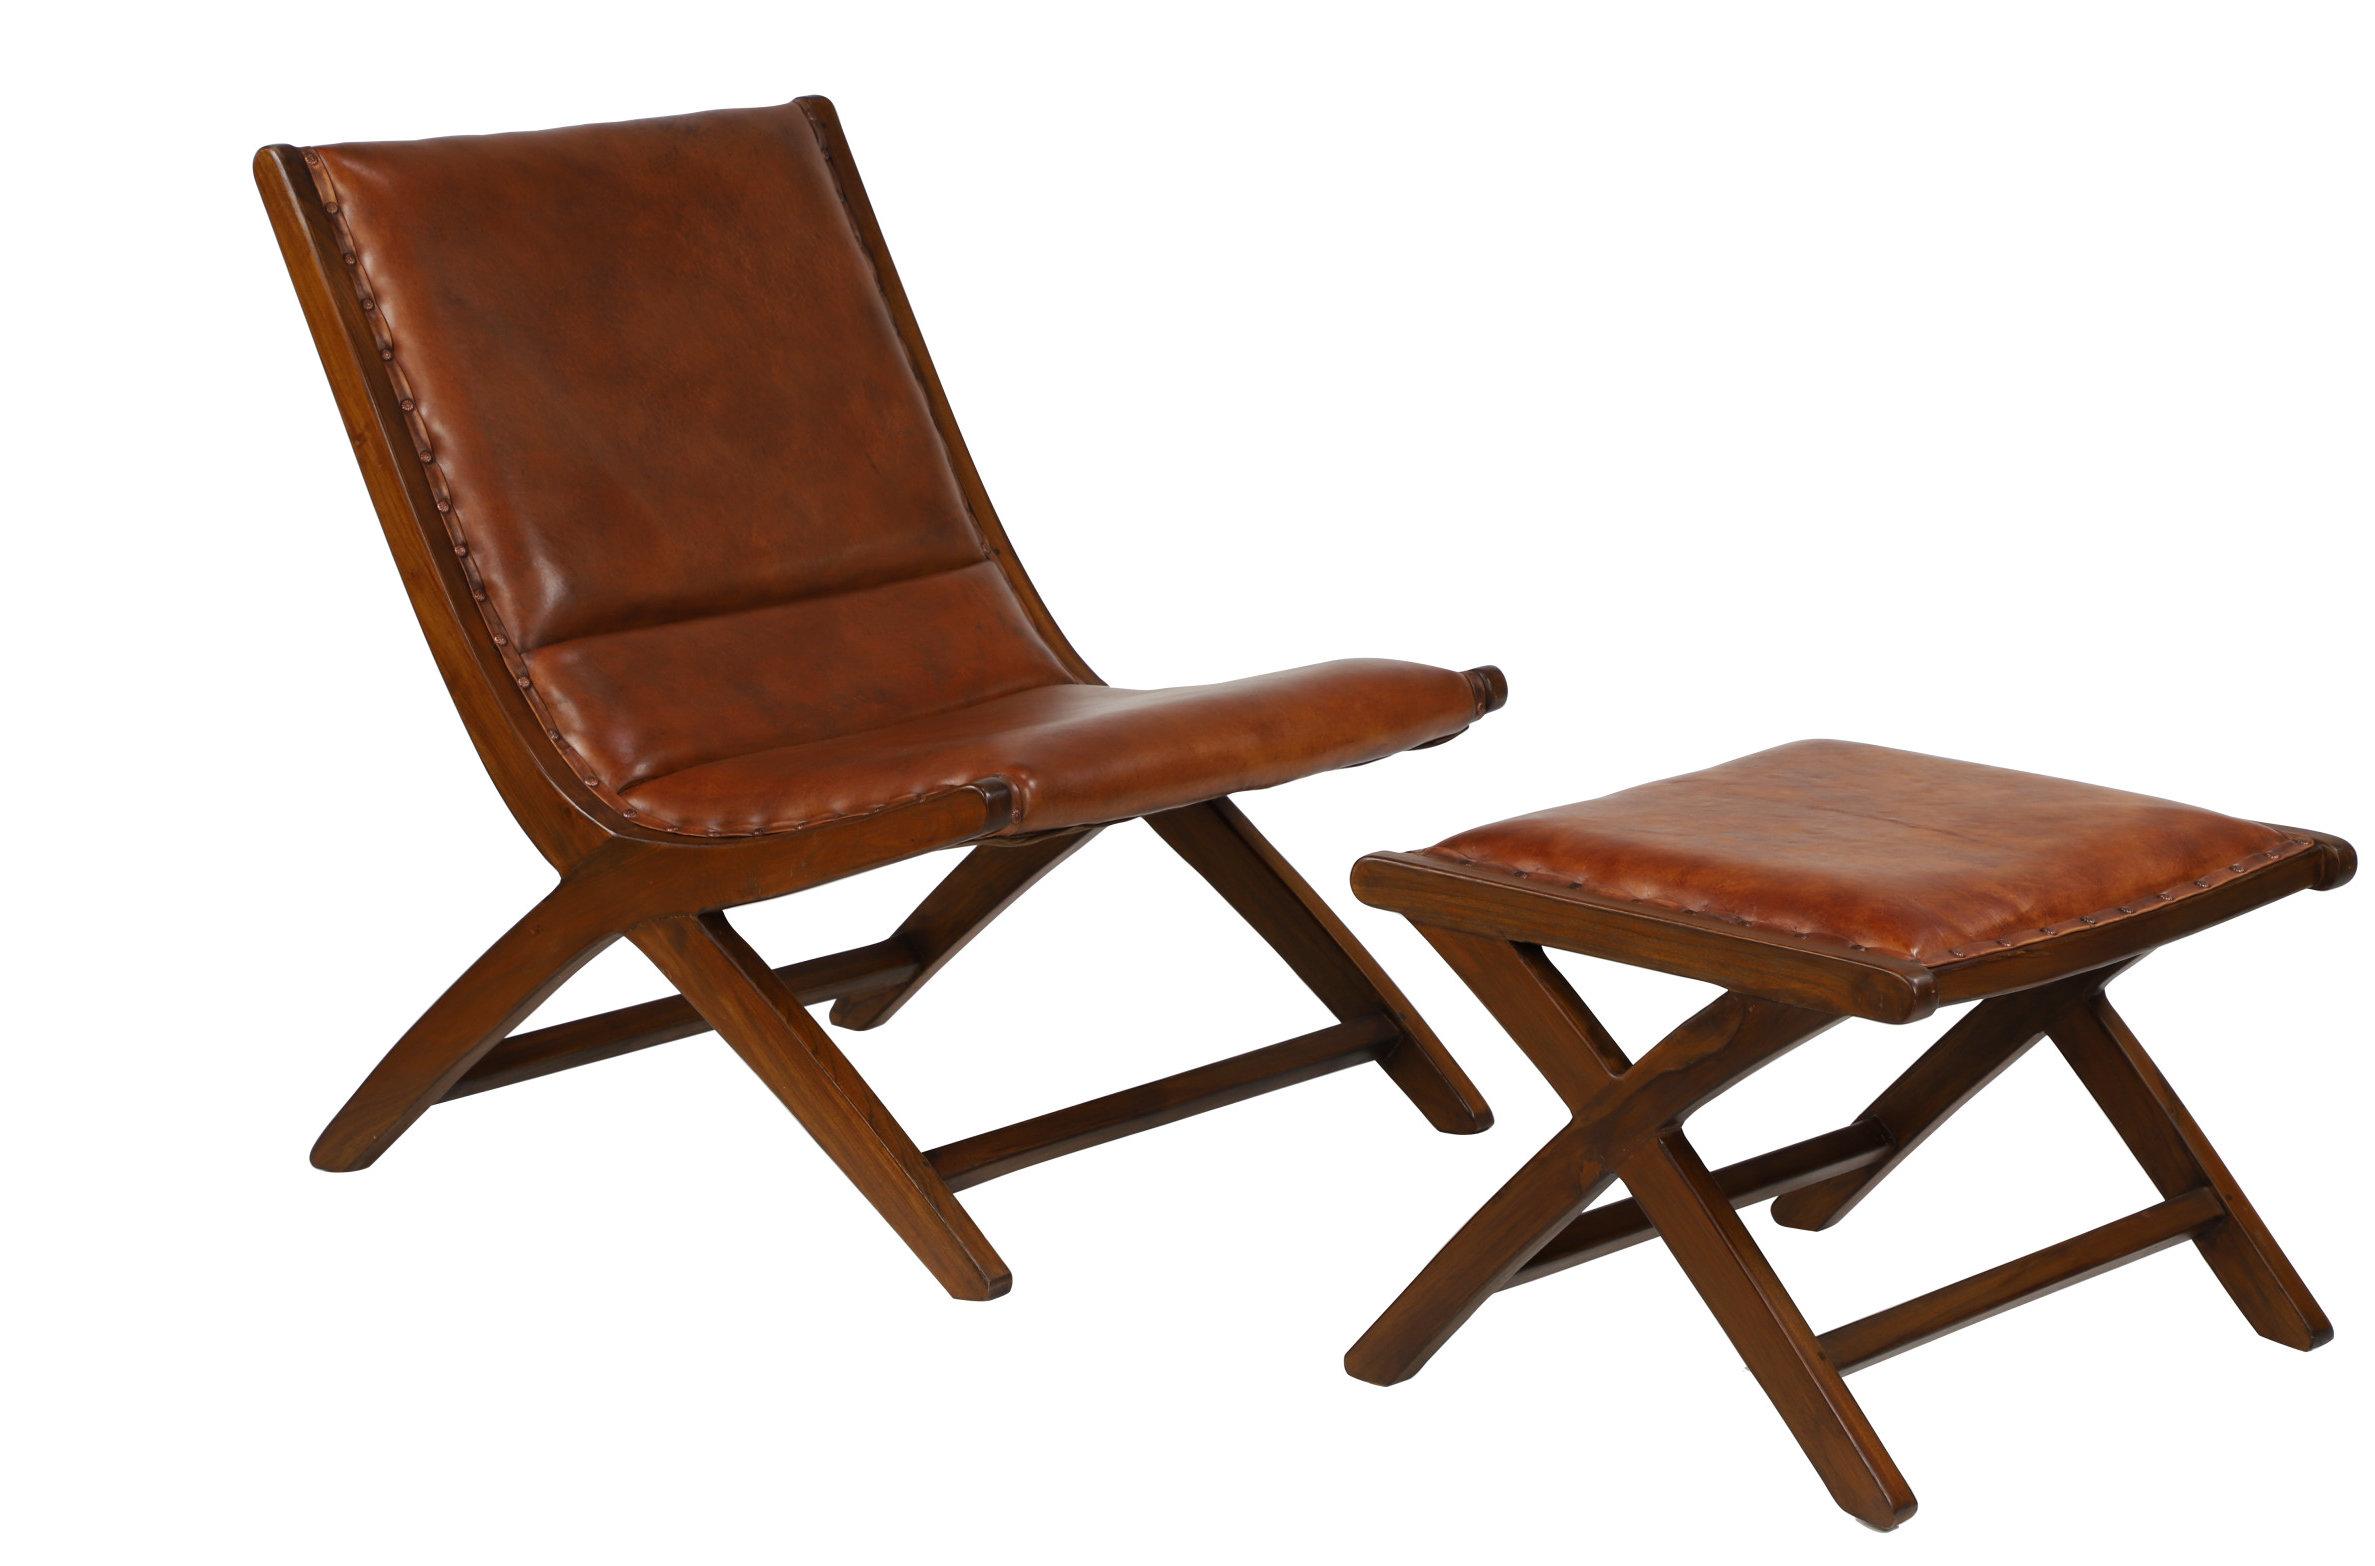 Brilliant Doerun Lounge Chair And Ottoman Ibusinesslaw Wood Chair Design Ideas Ibusinesslaworg